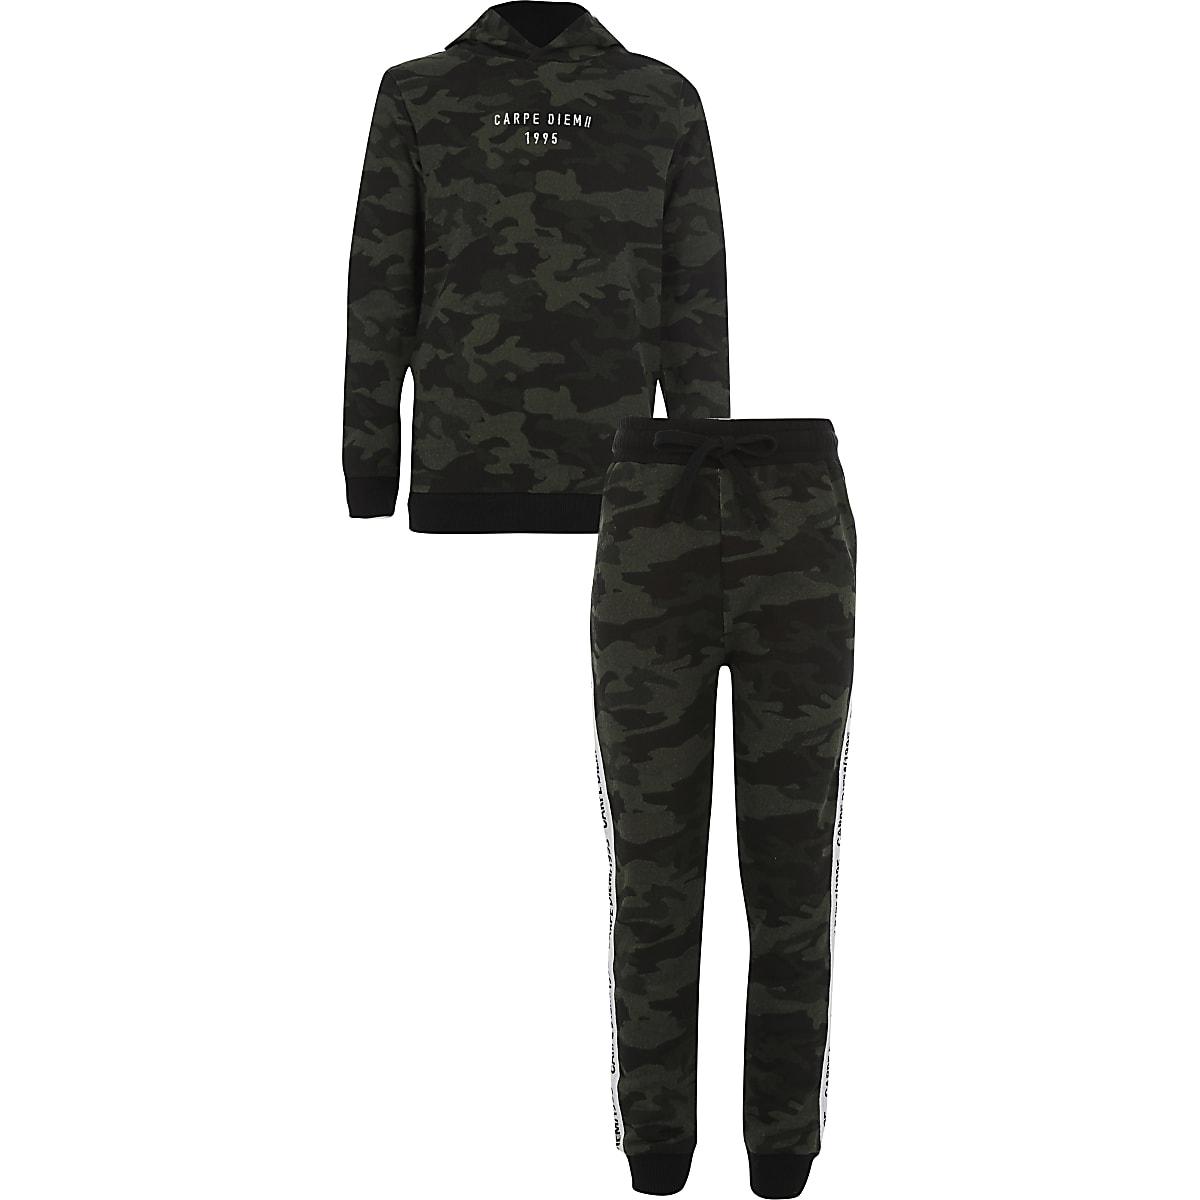 Boys khaki 'carpe diem' camo hoodie outfit